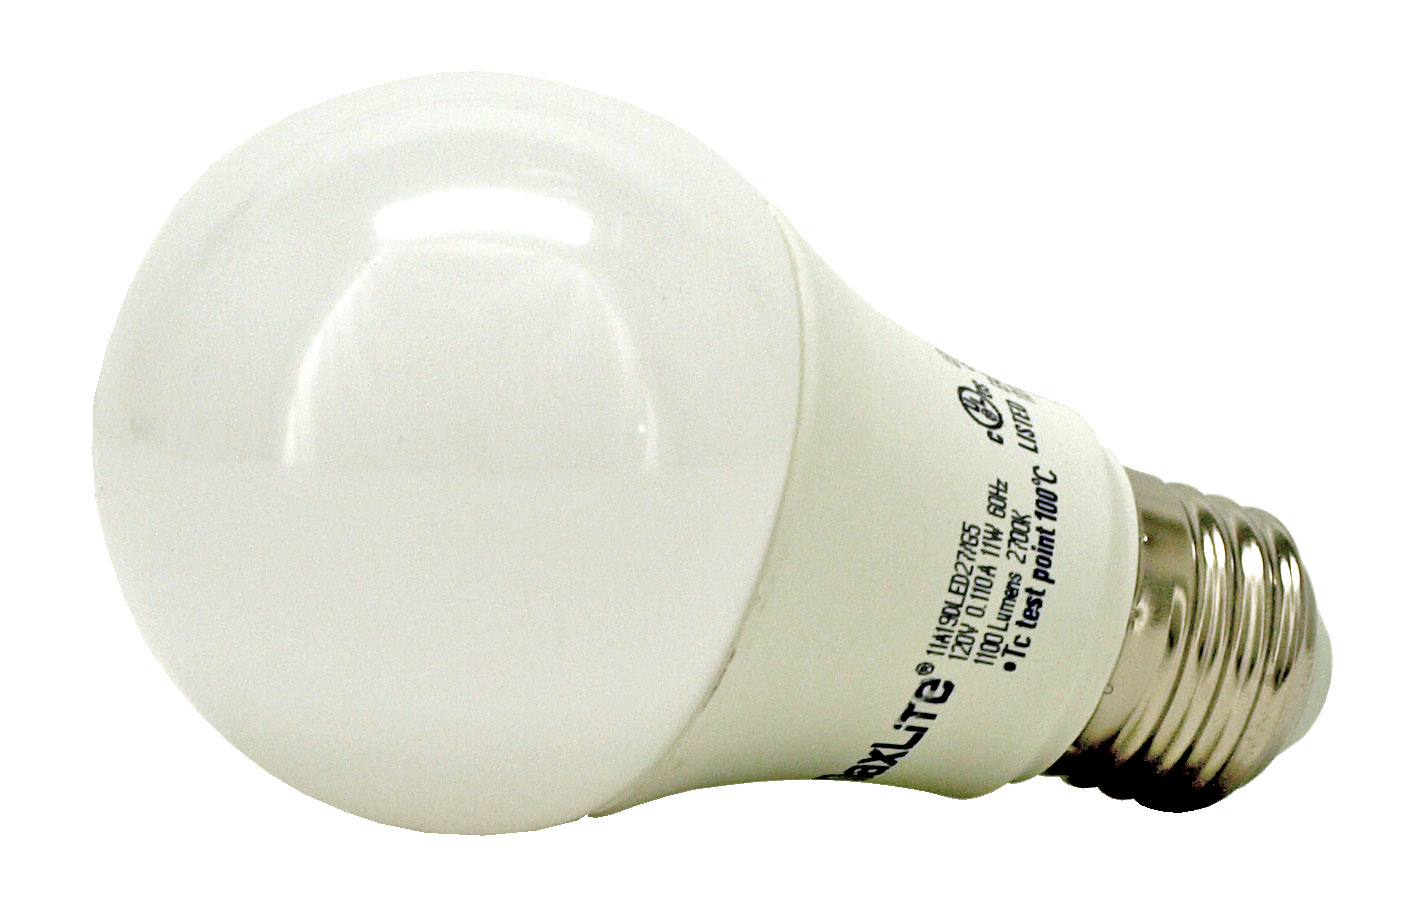 A19 LED Light Bulb - 1100 Lumens - 2700k